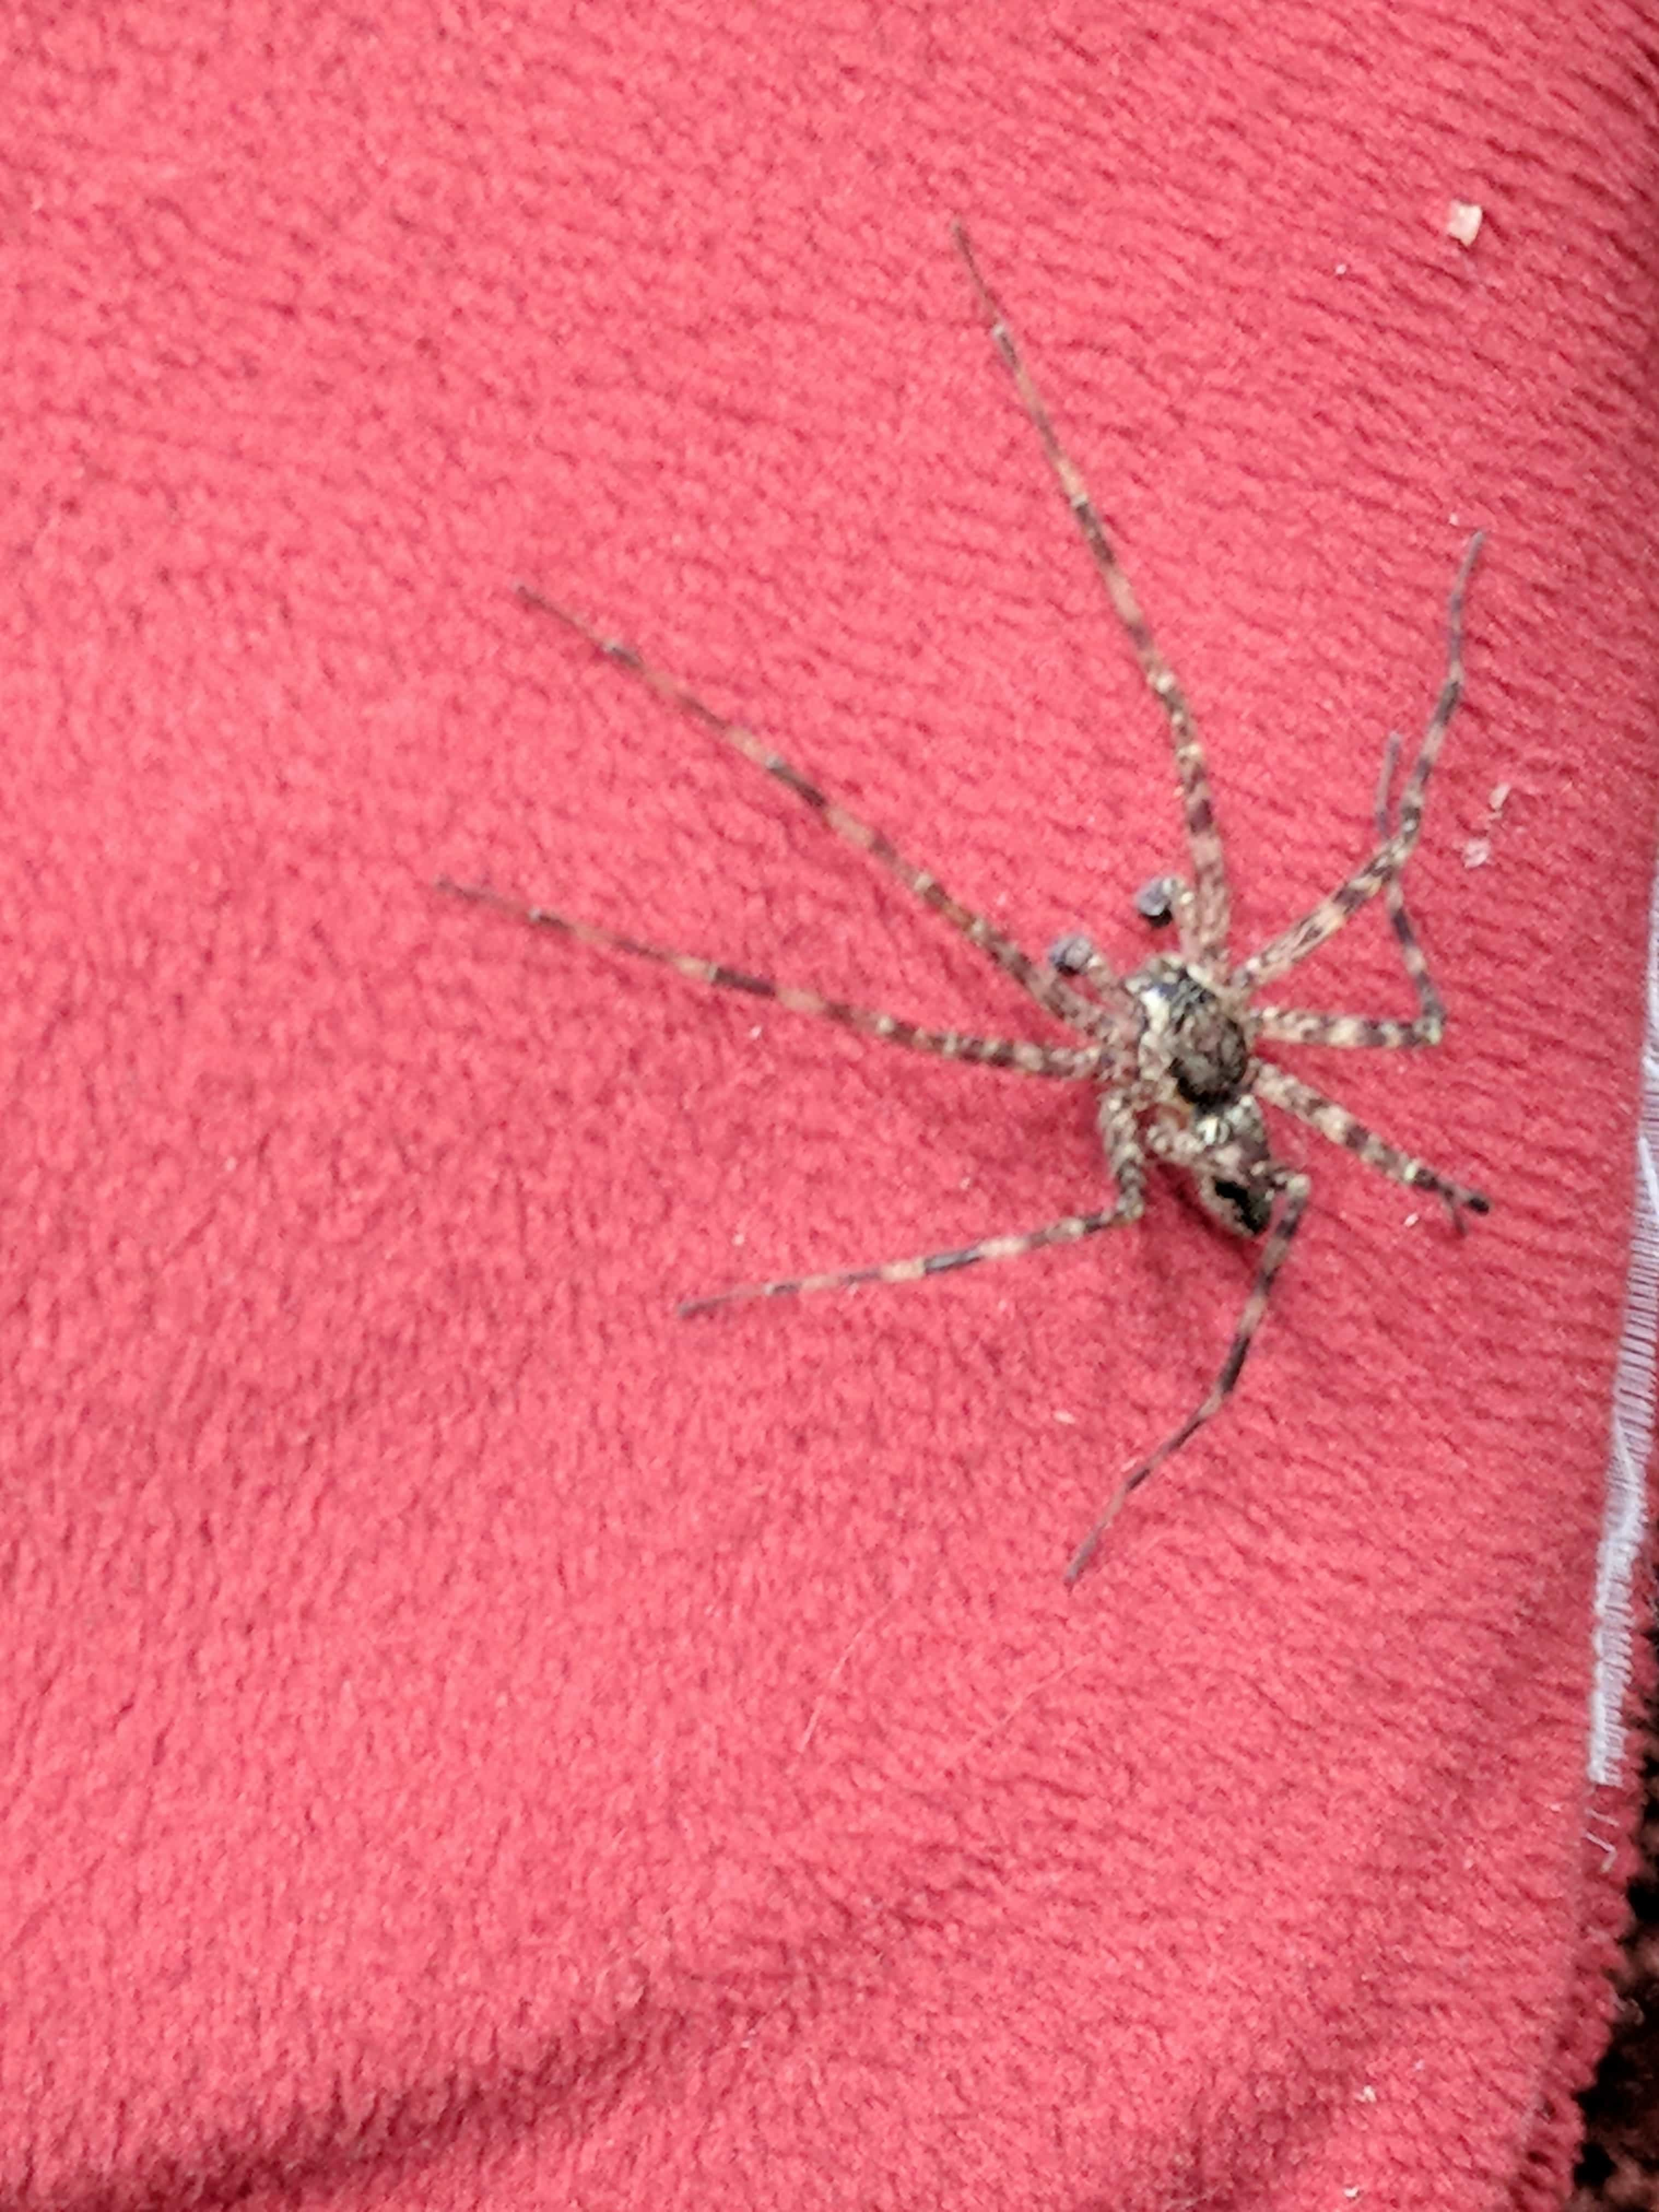 Picture of Dolomedes tenebrosus (Dark Fishing Spider) - Male - Dorsal